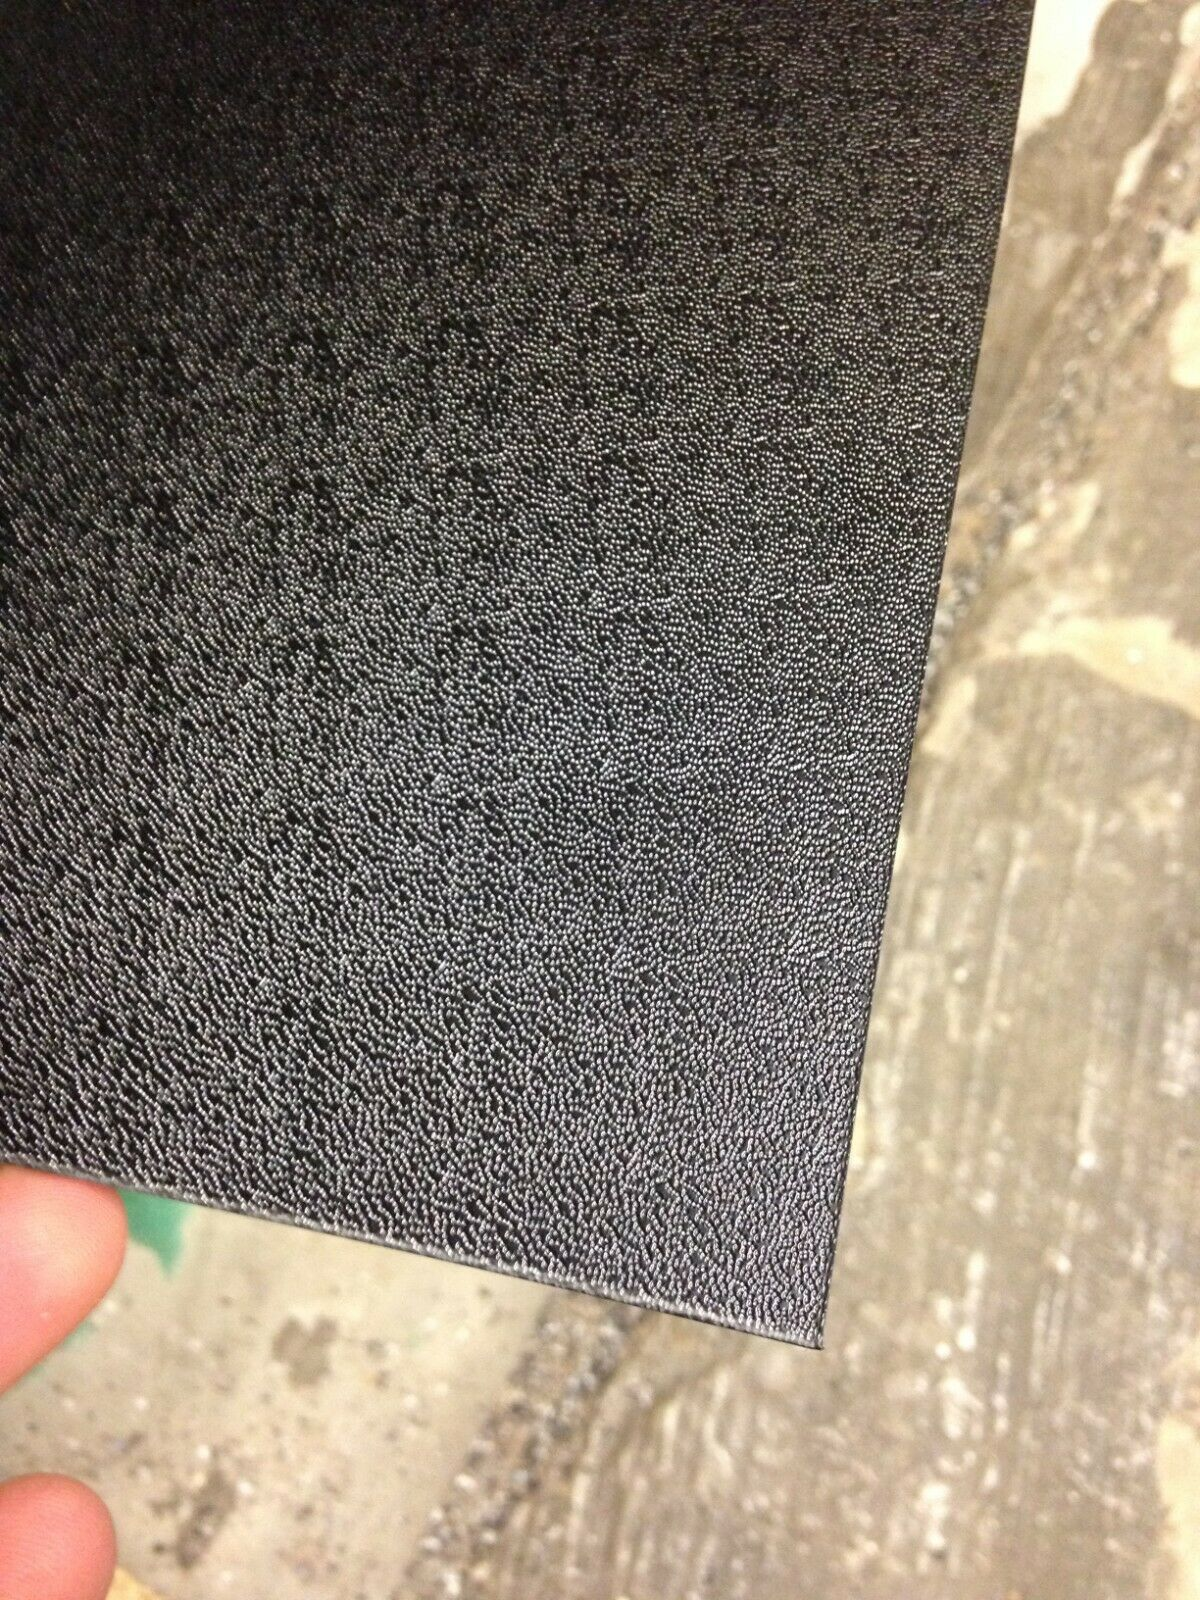 3mm Black Pinseal Textured Finish ABS Plastic Sheet 1000mm x 600mm